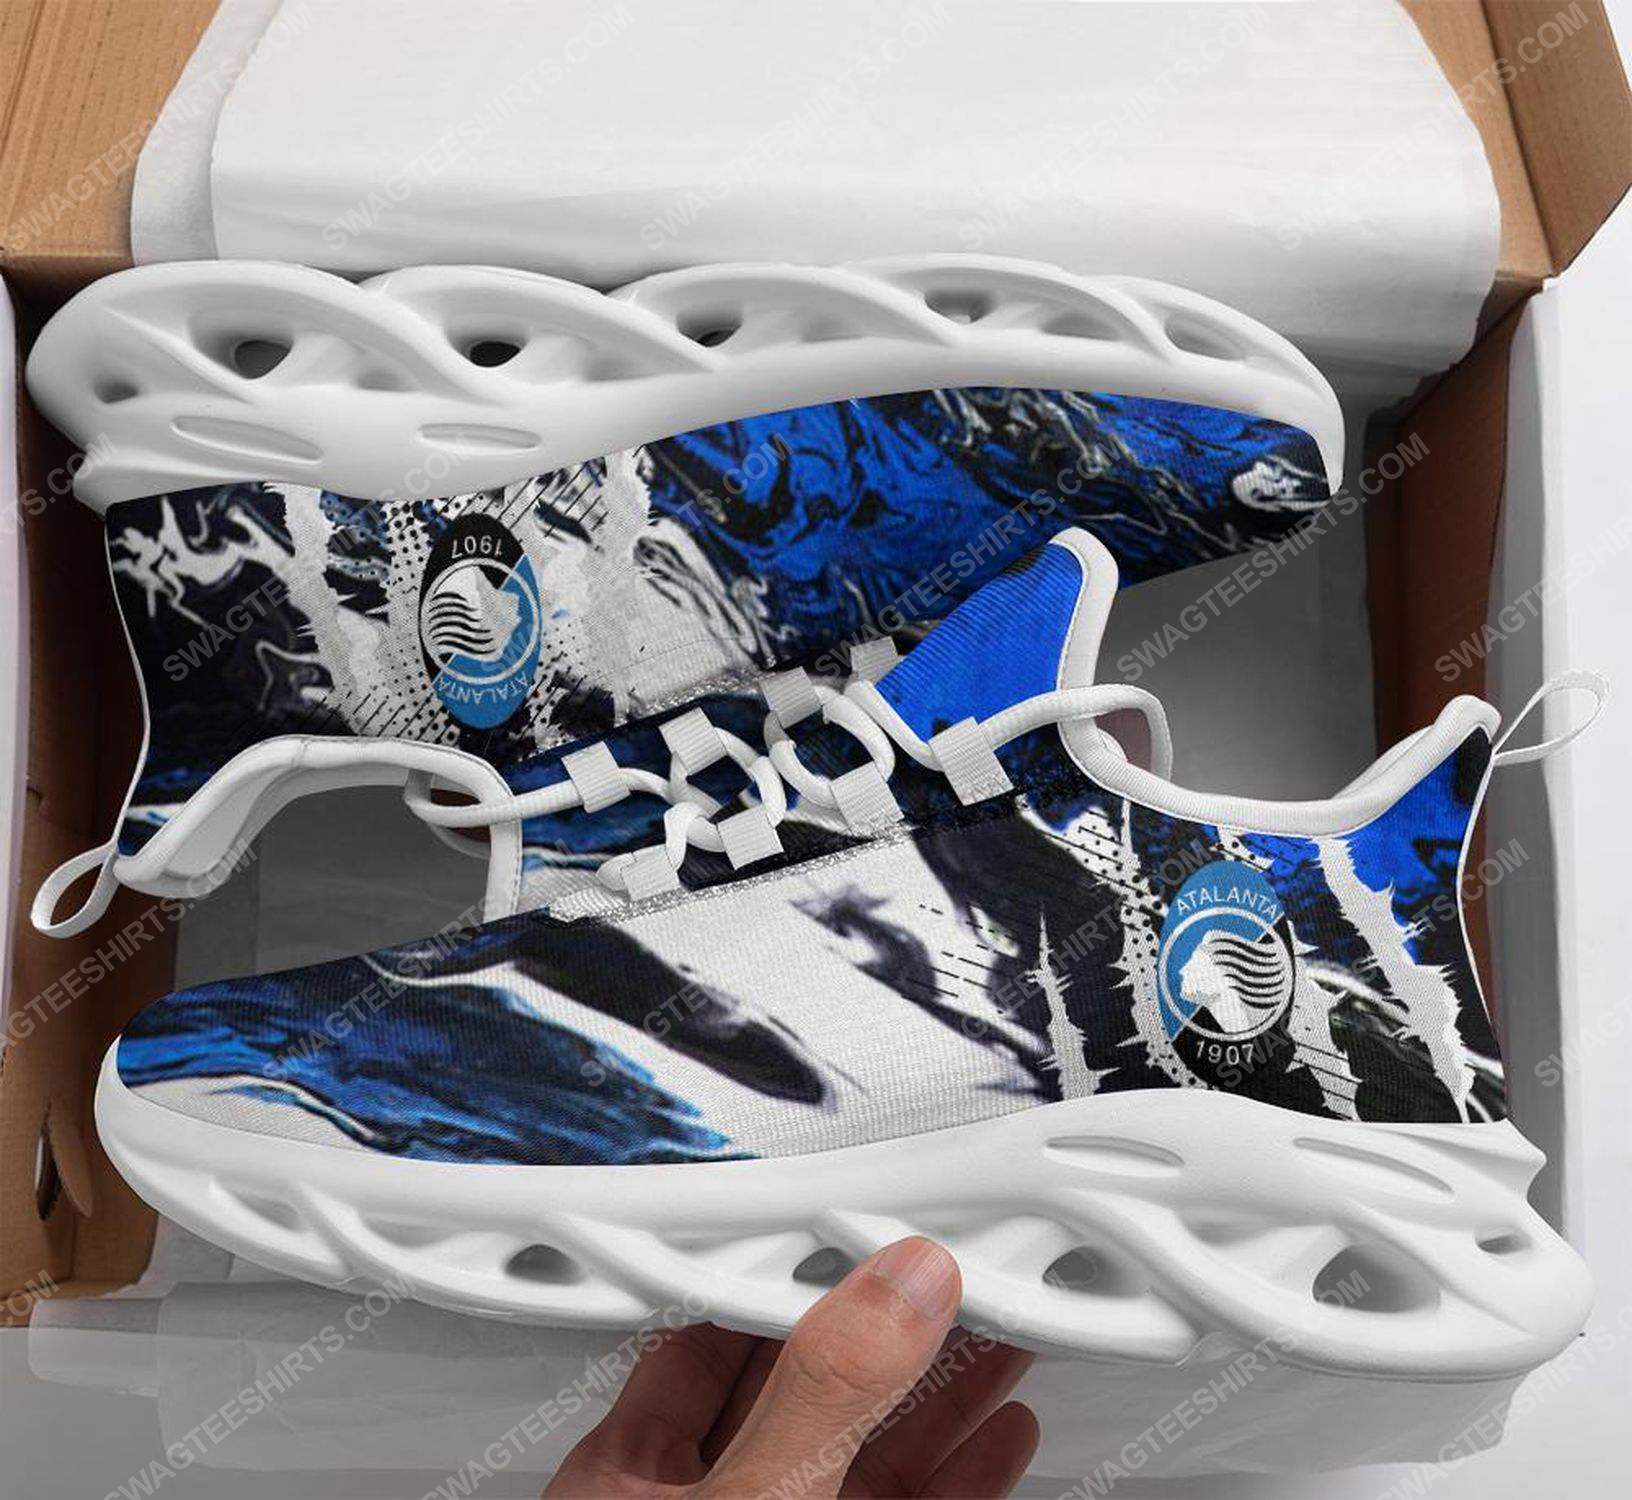 Football club atalanta bergamasca calcio max soul shoes 1